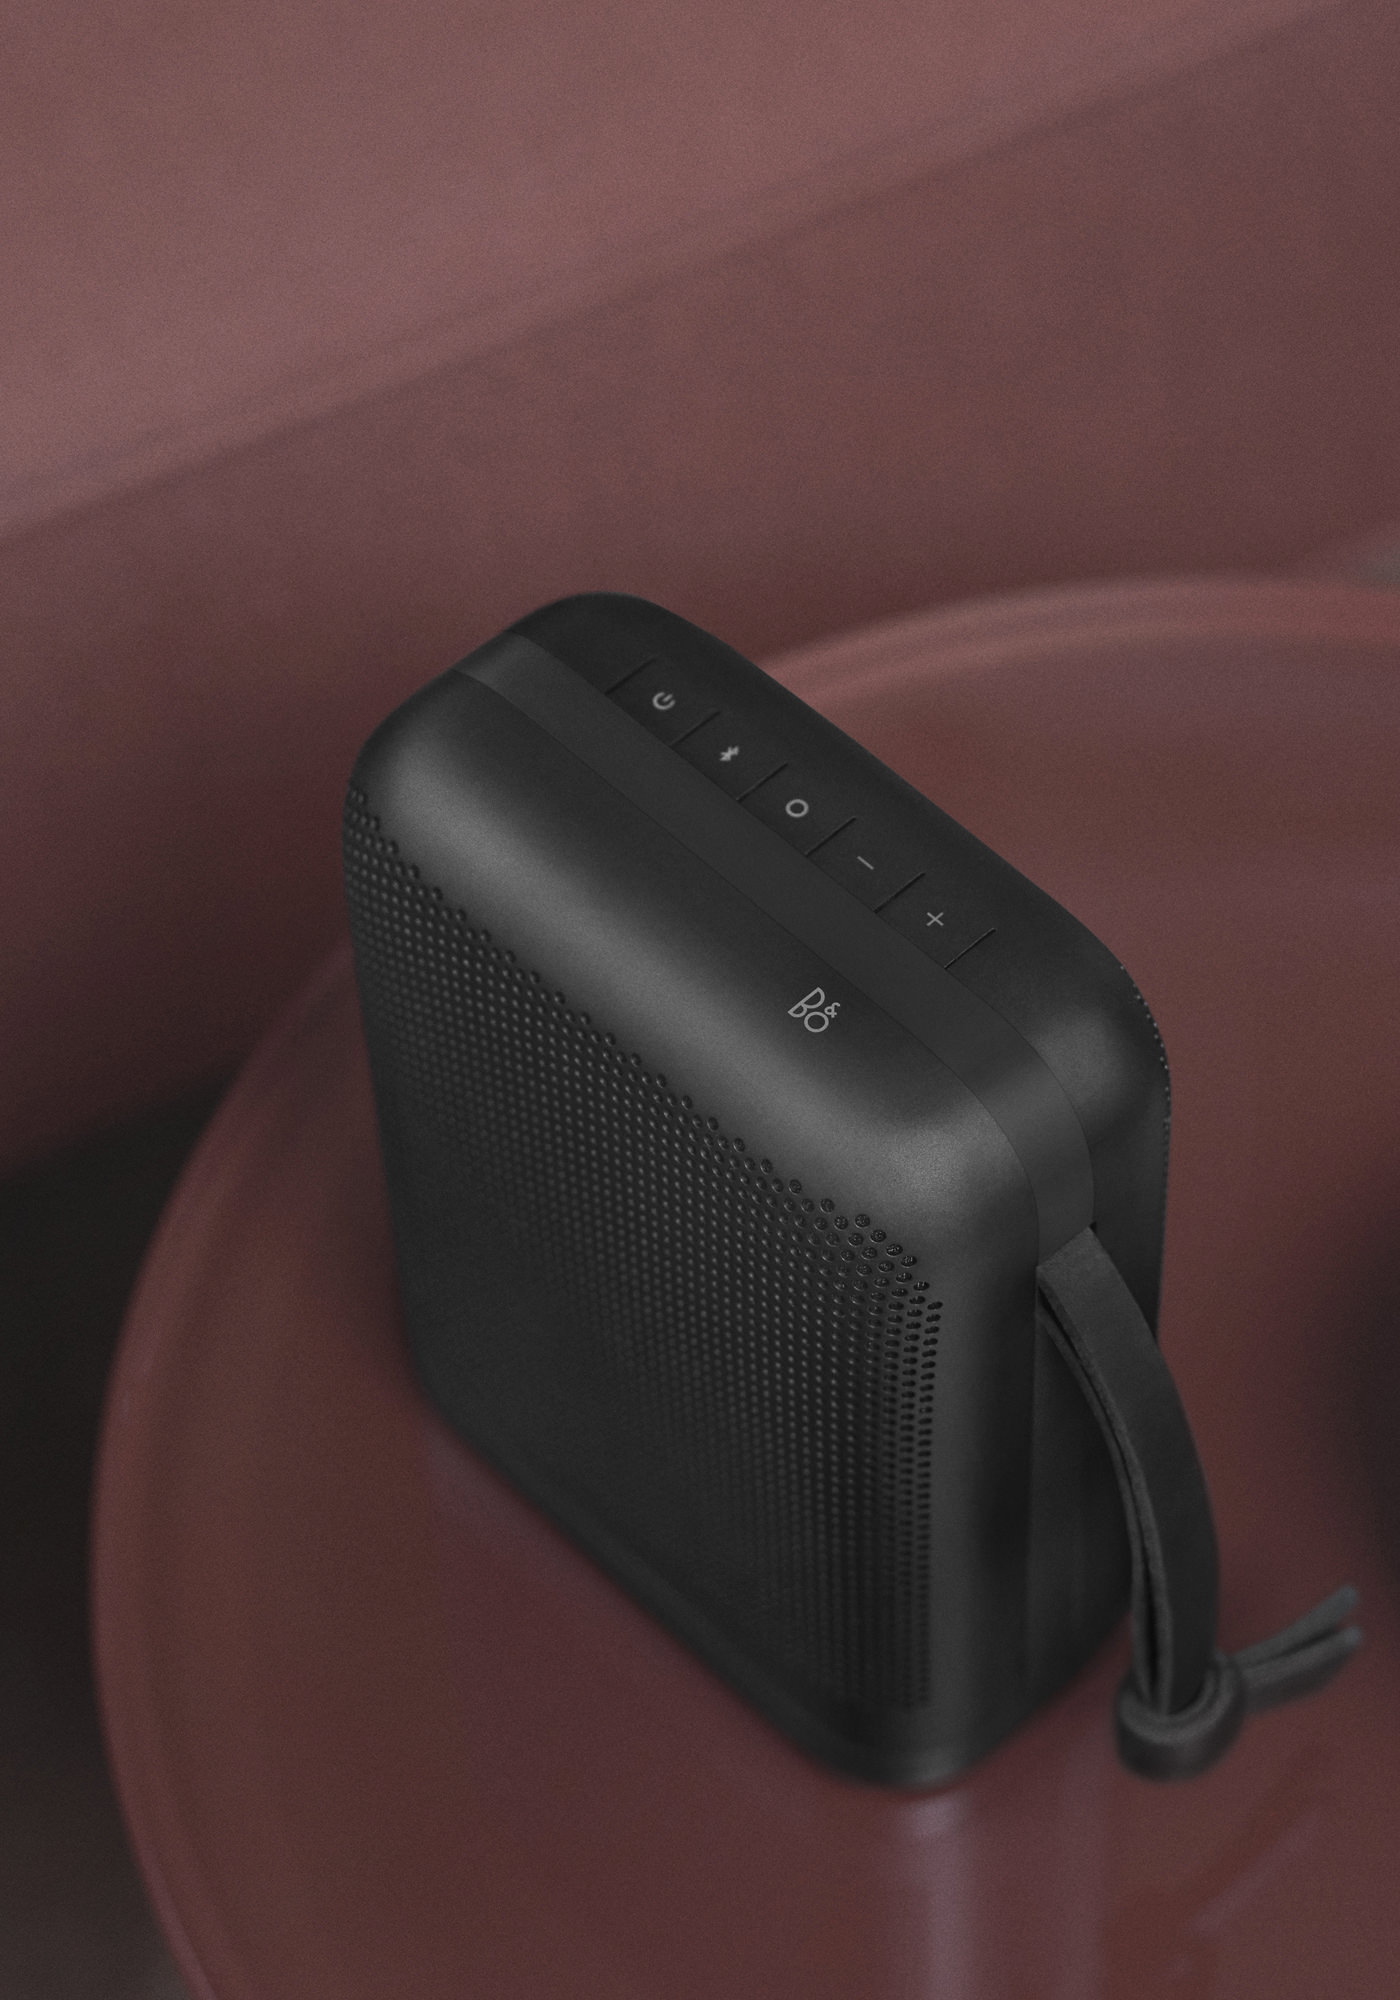 Enceinte Beoplay P6 Bang & Olufsen Black Edition